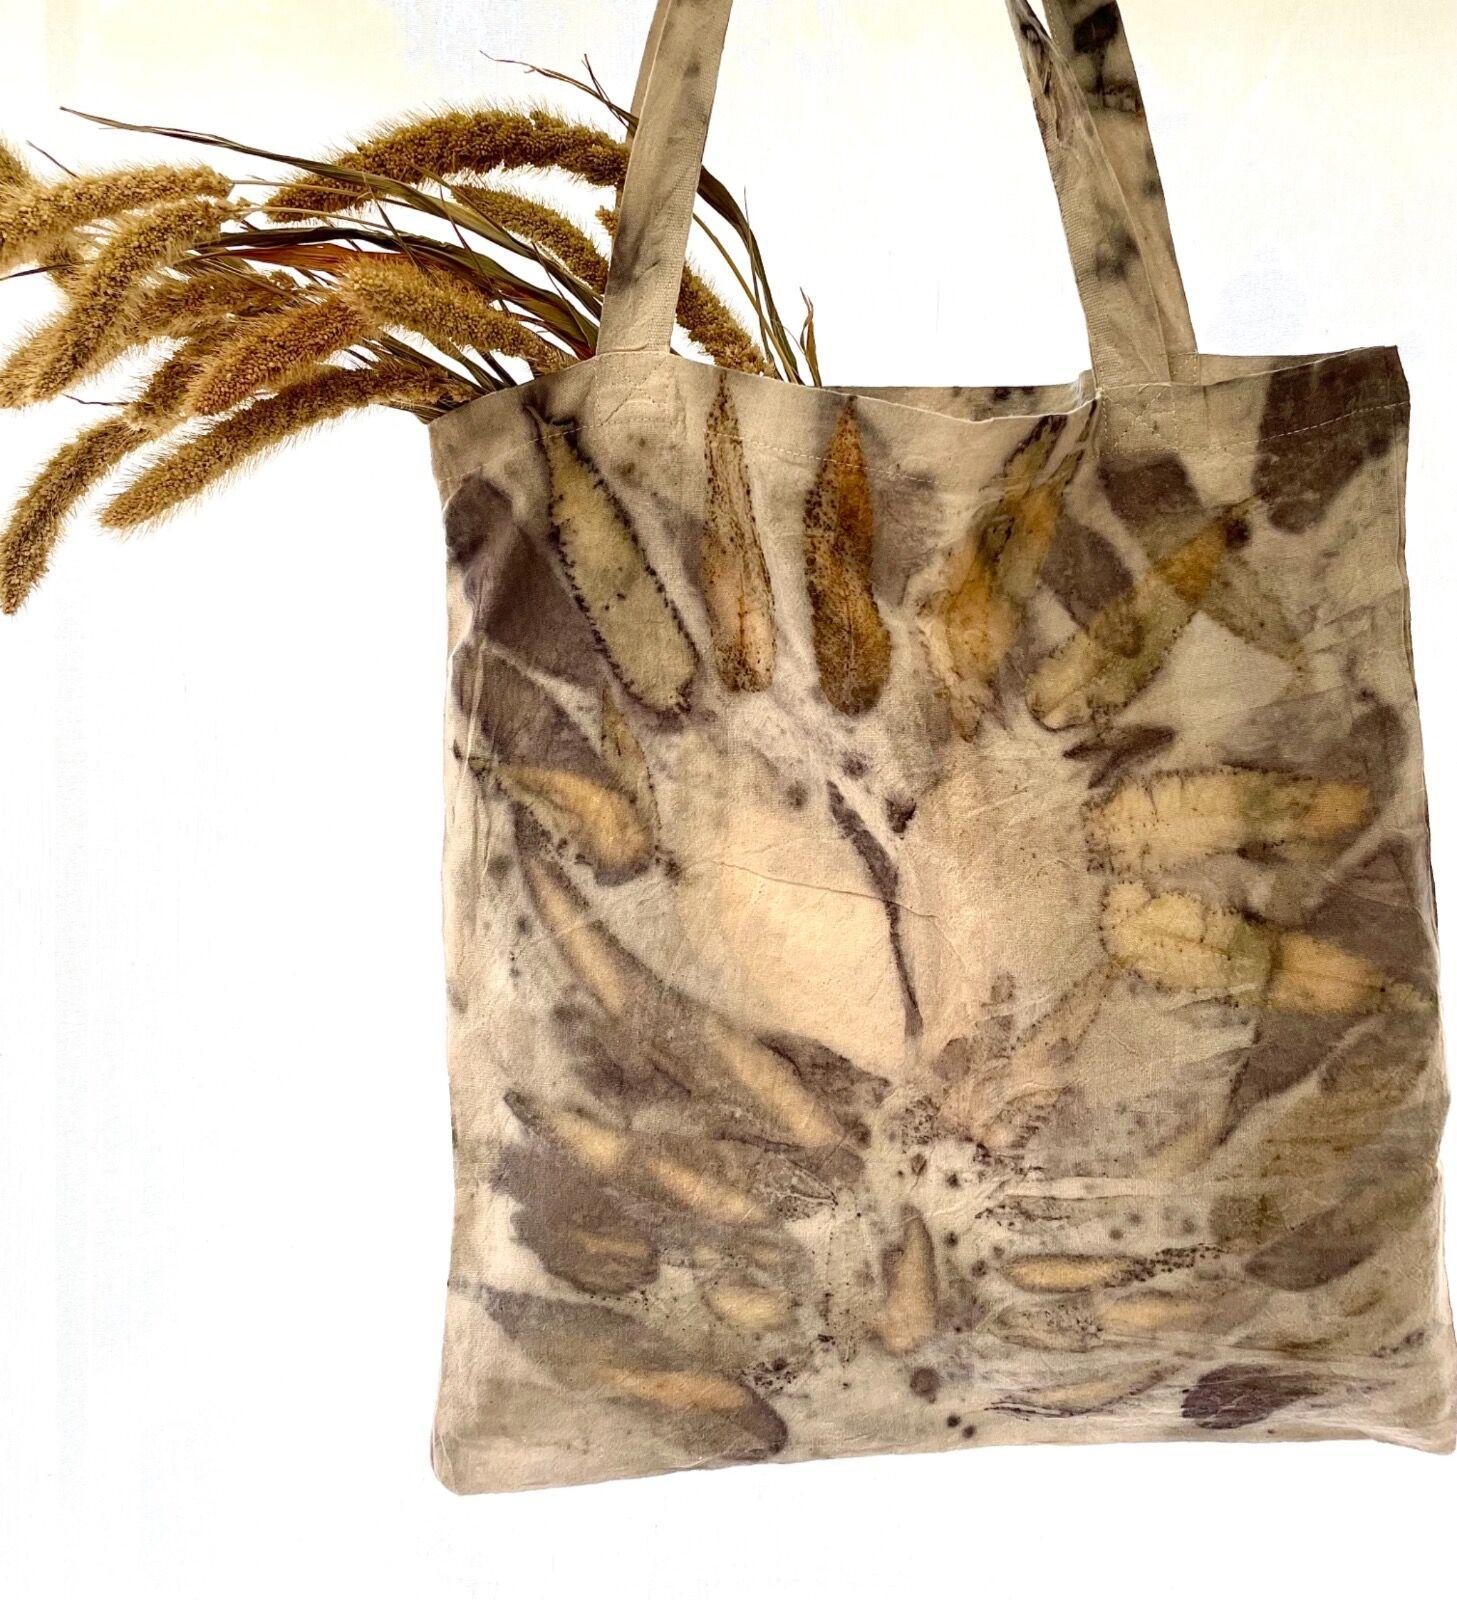 Eco-print tote bag, Sumac and eucalyptus